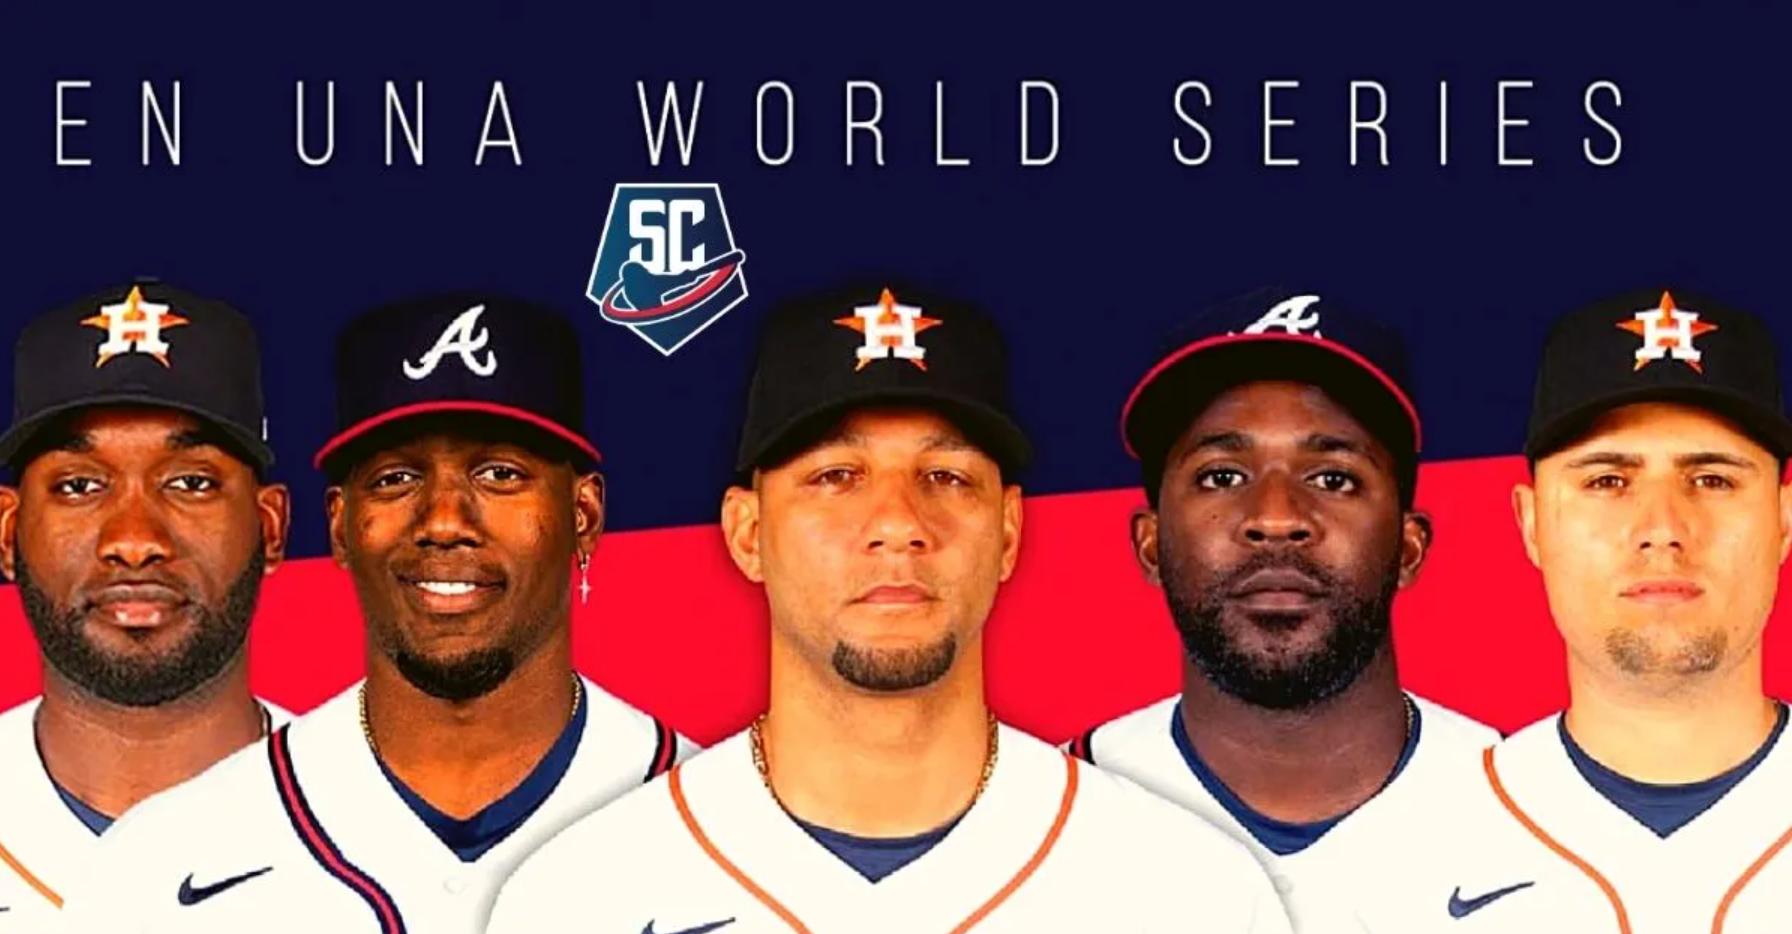 Bravos y Astros a Serie Mundial inédita